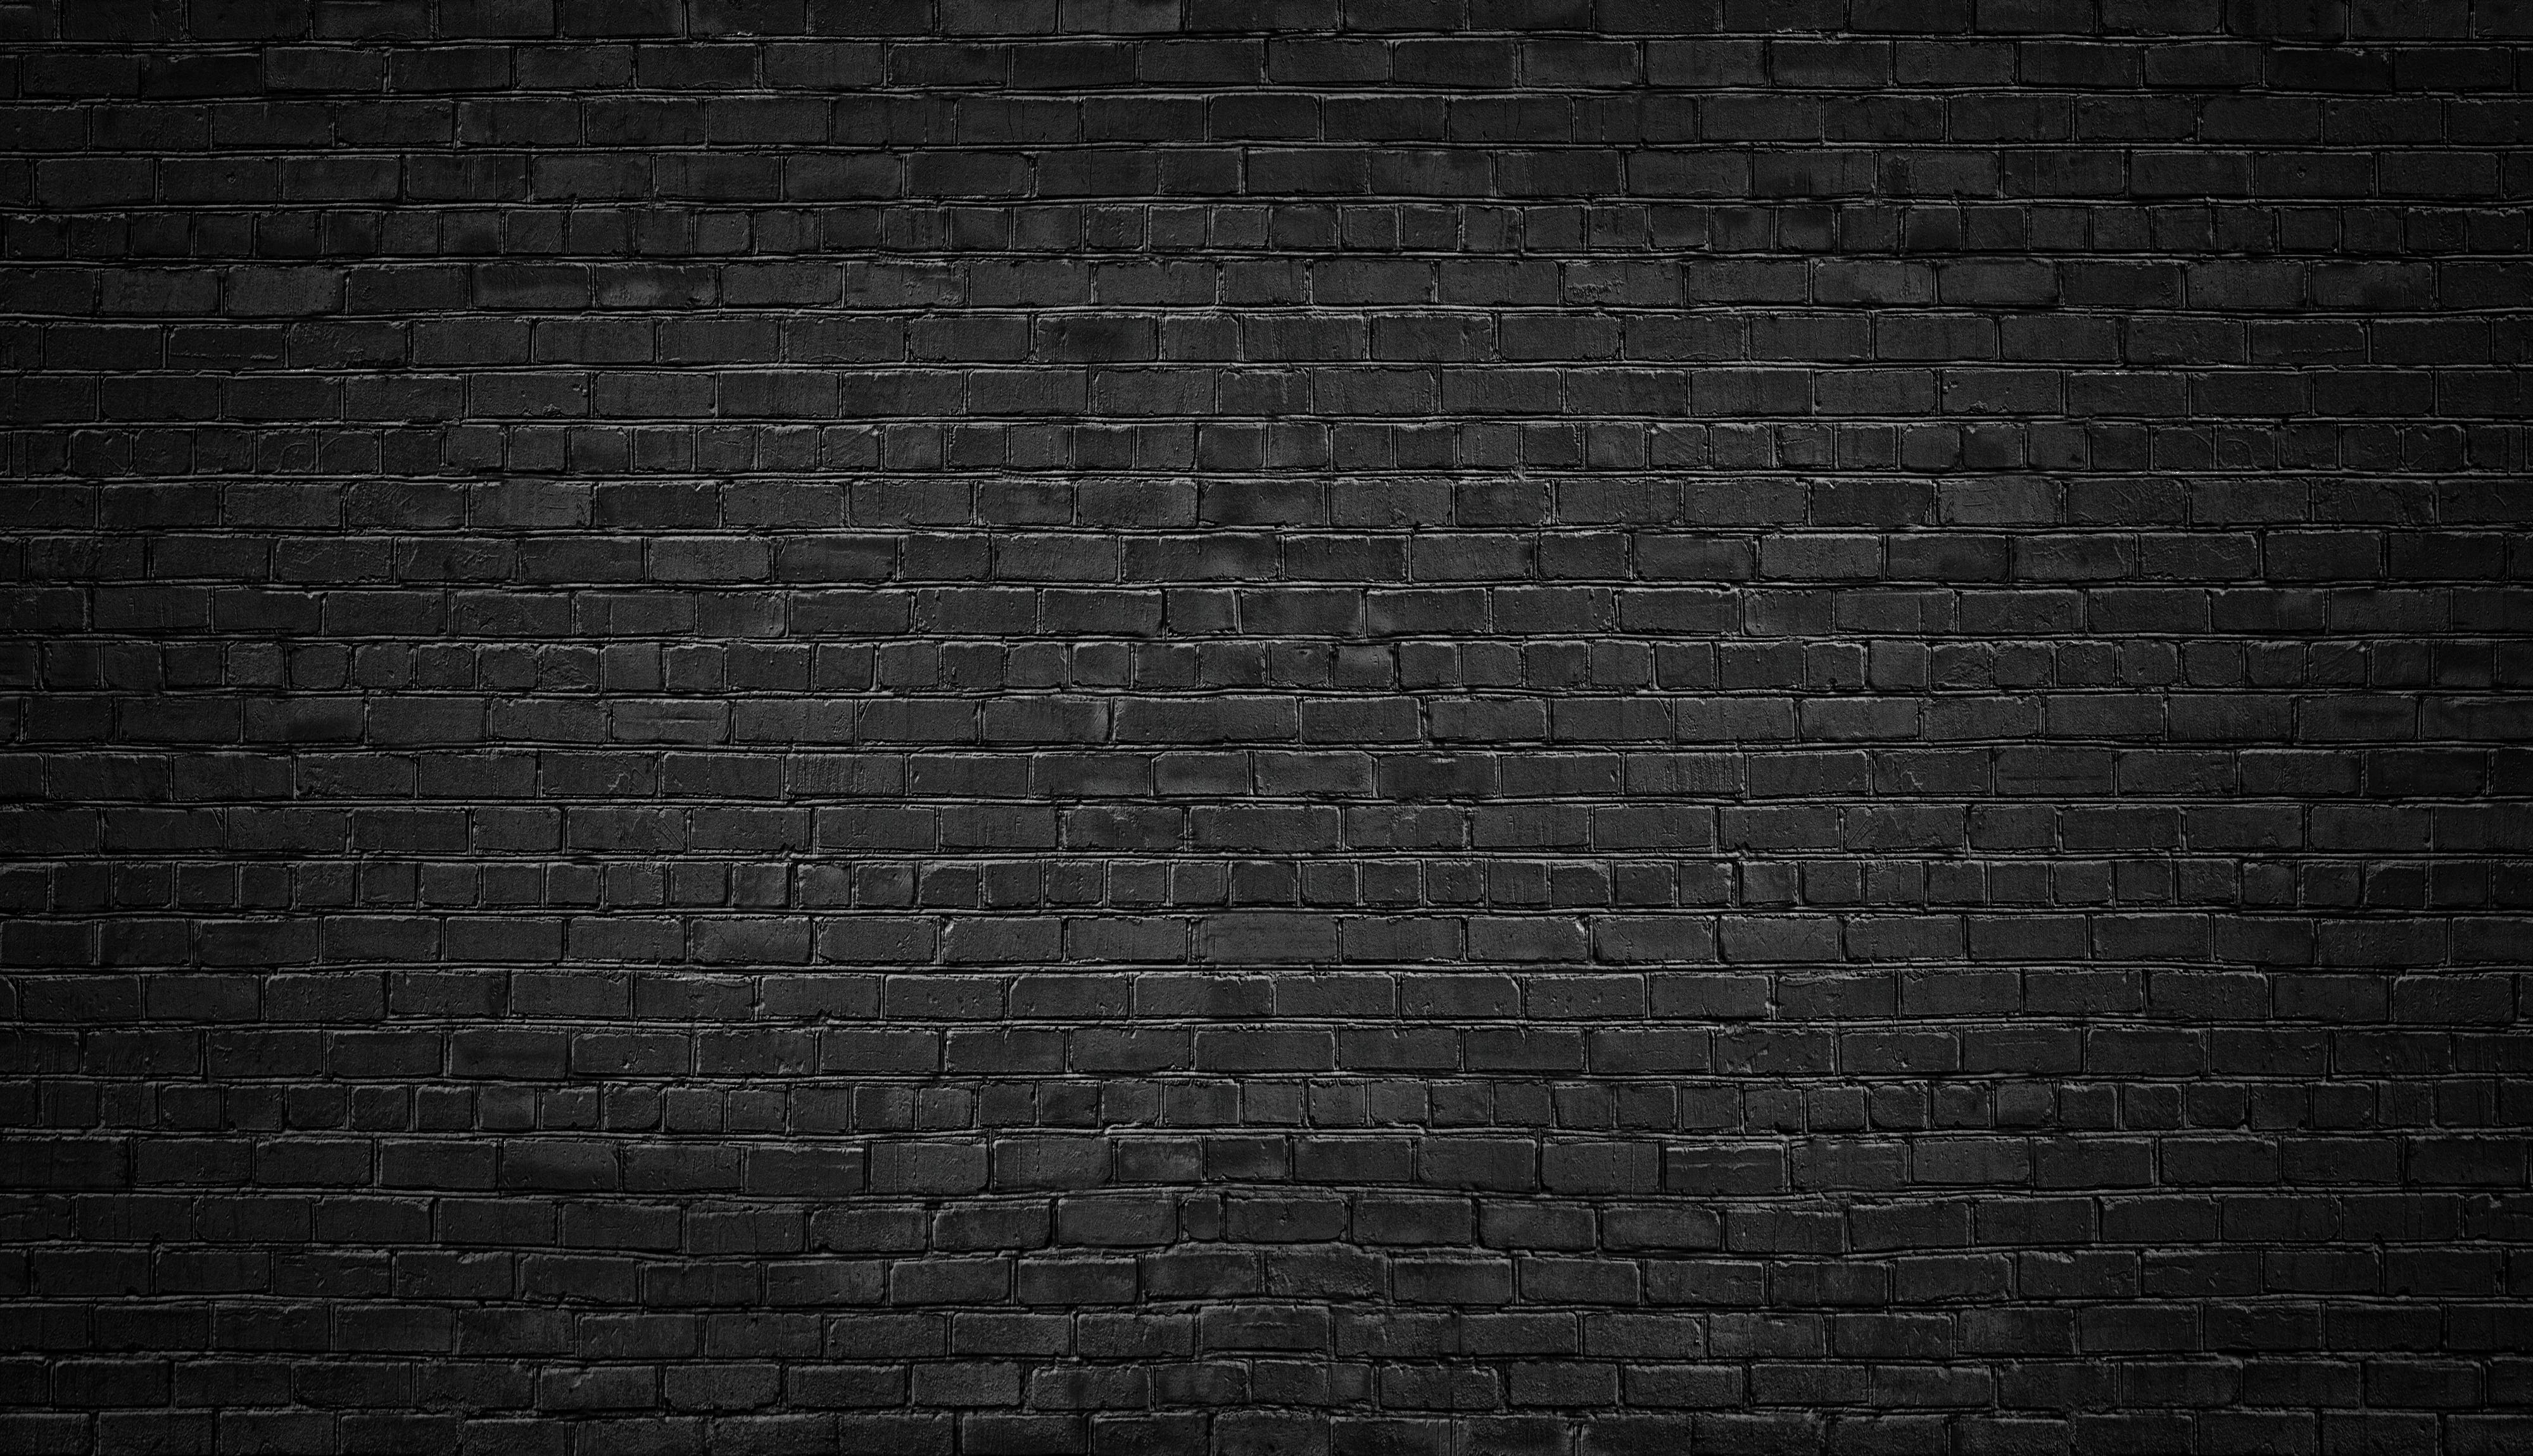 black brick wall background. texture dark masonry